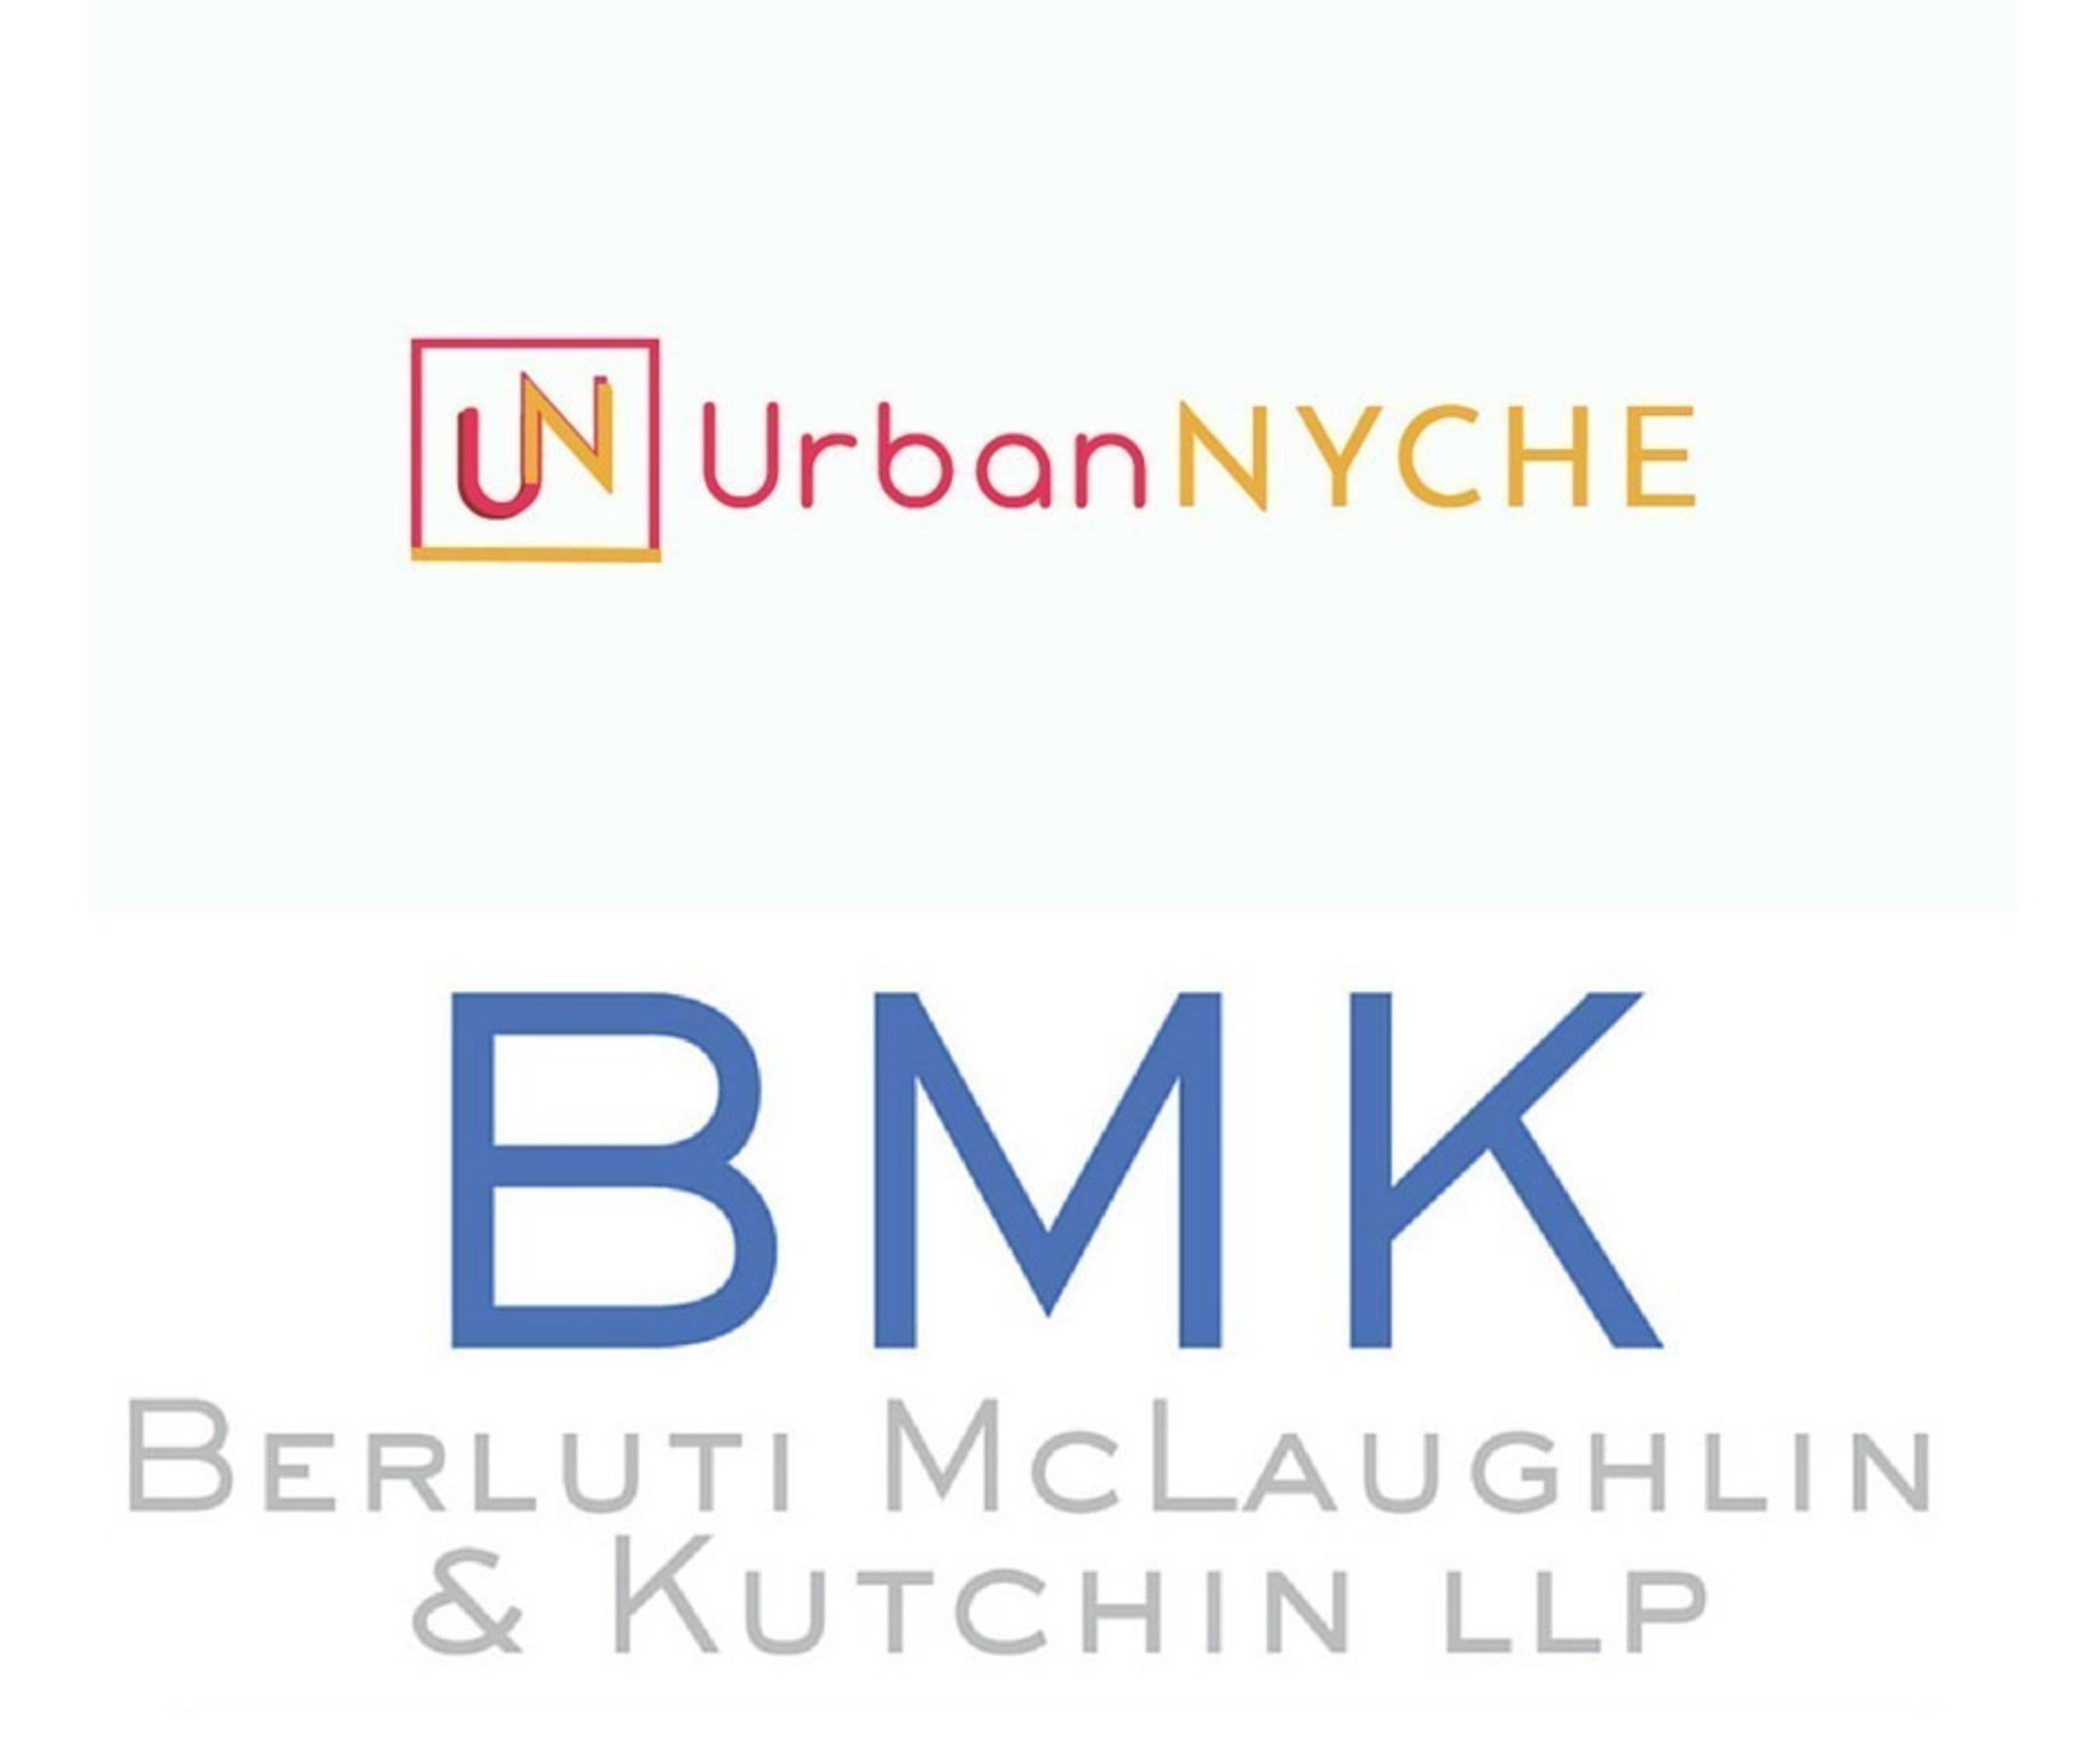 Urban NYCHE Marketing, Inc. & Berluti McLaughlin & Kutchin LLP